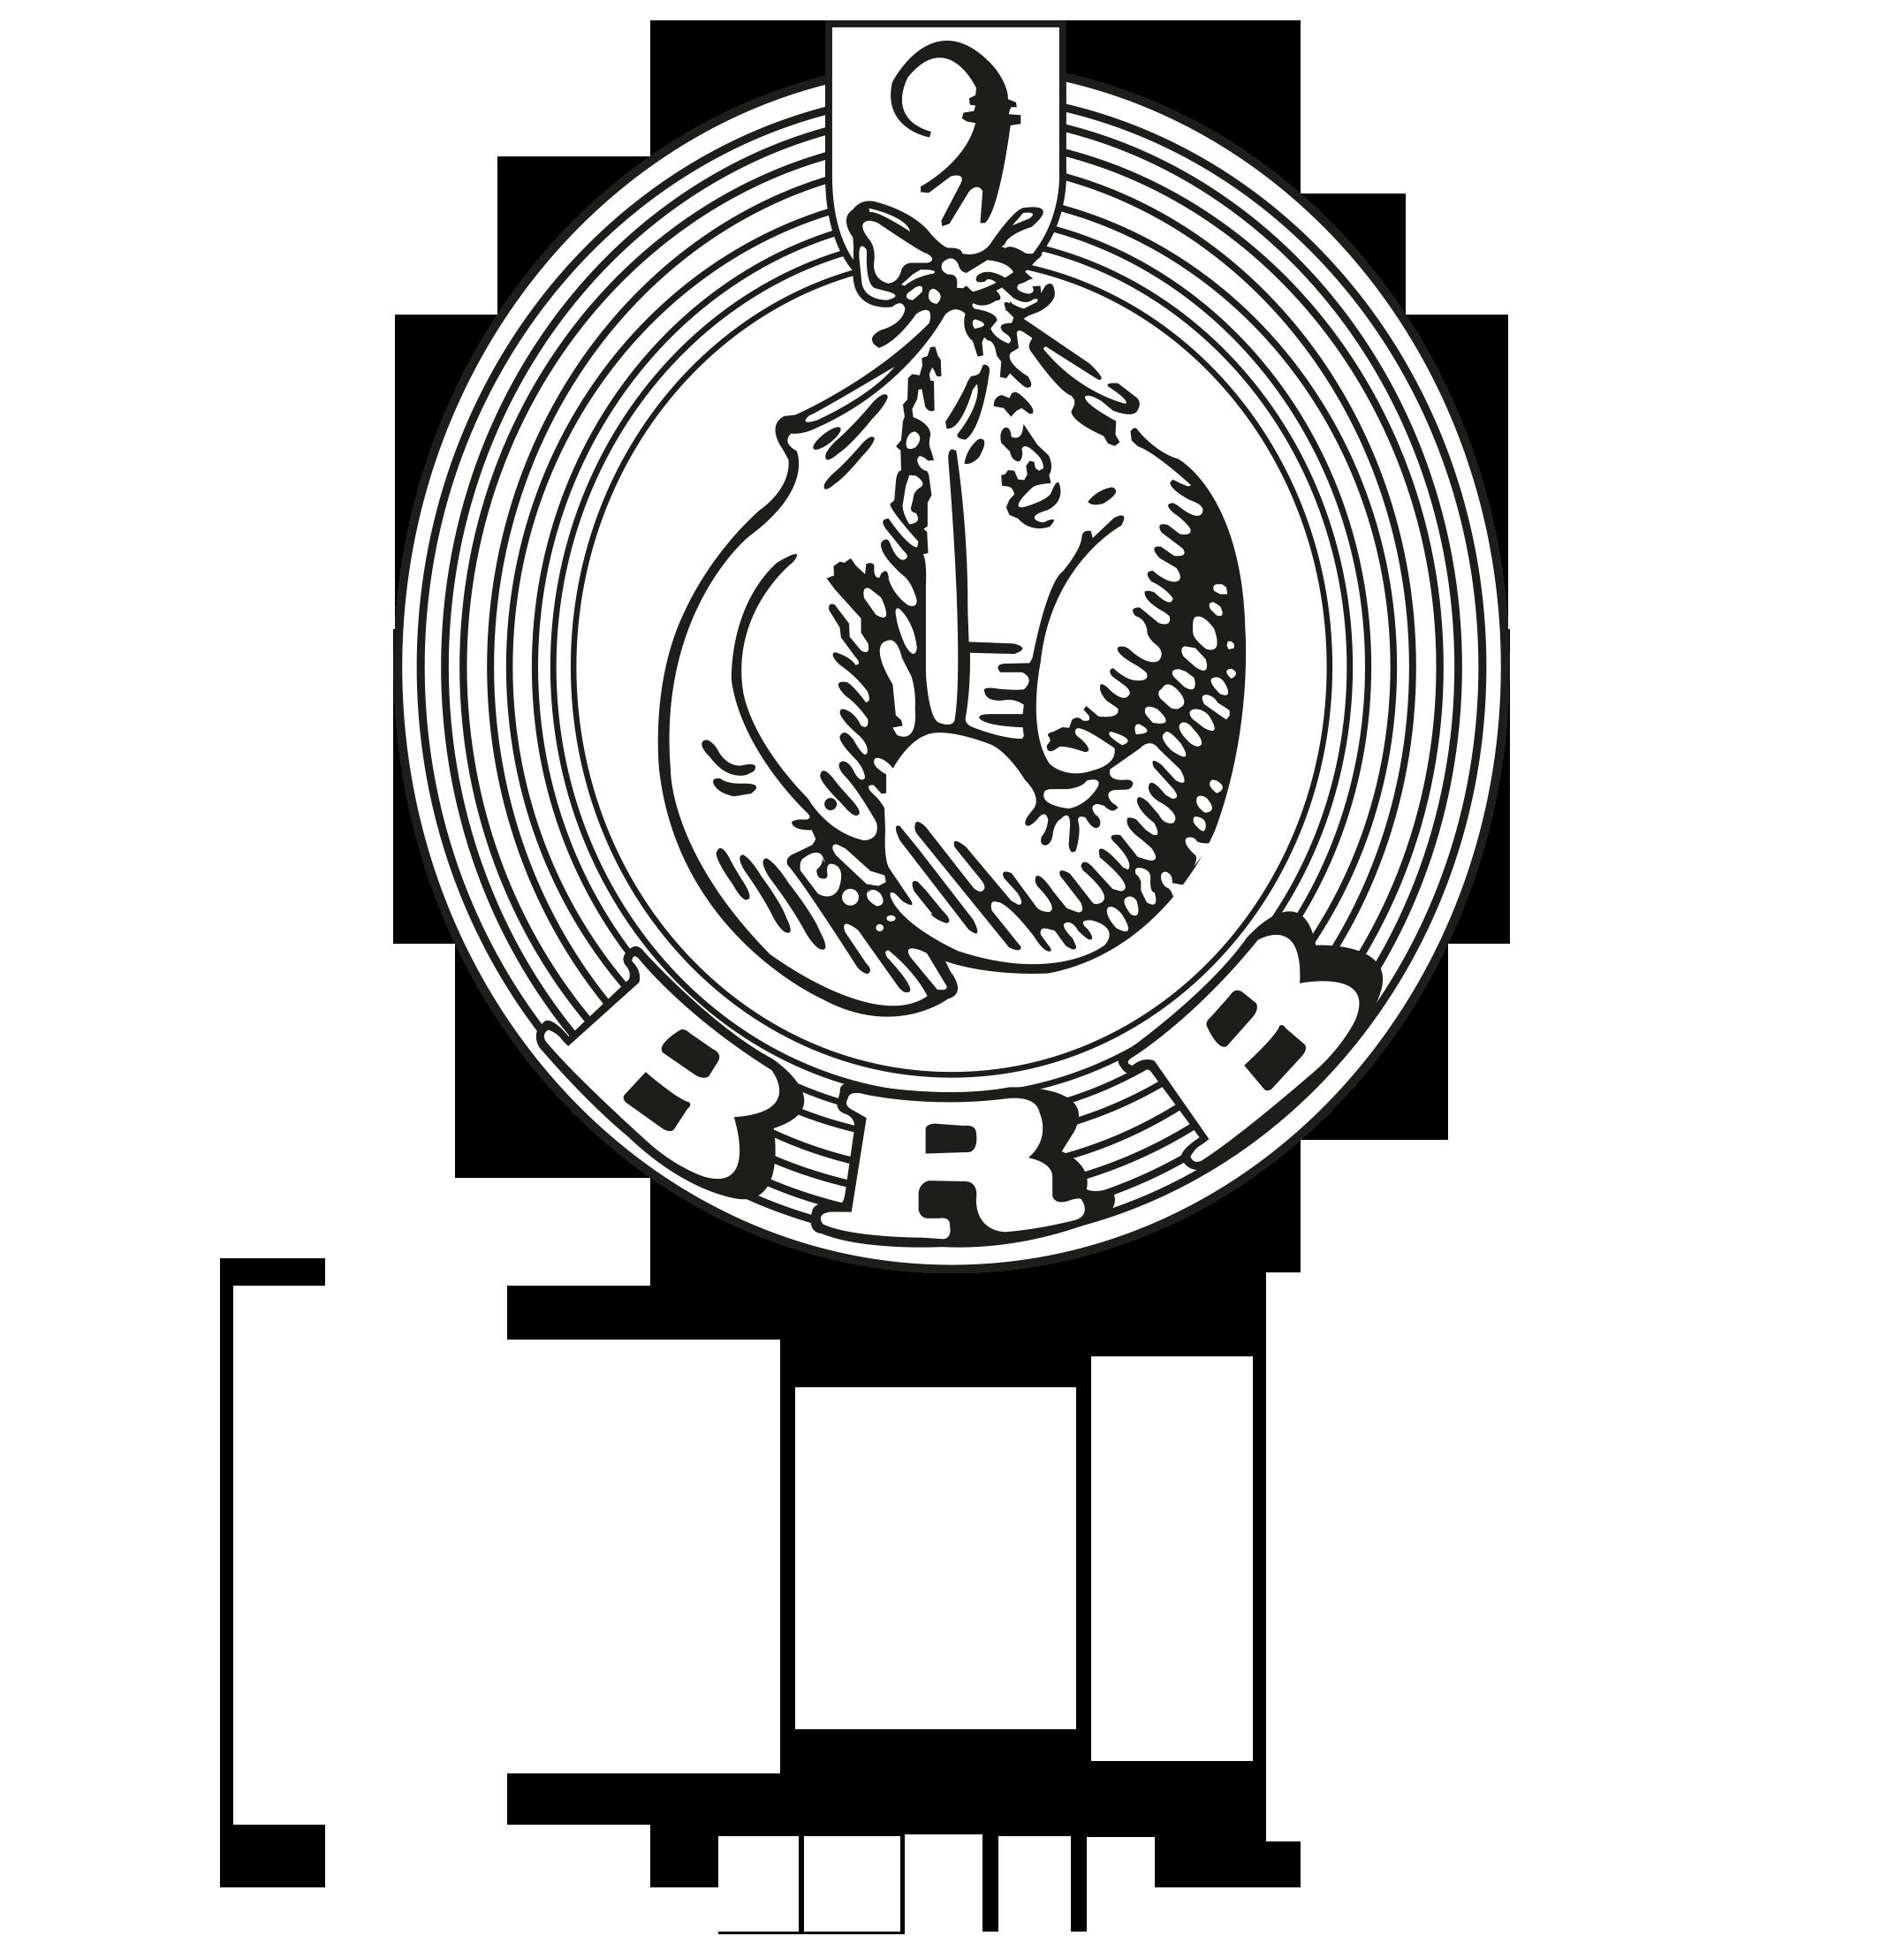 BOXRING BASEL